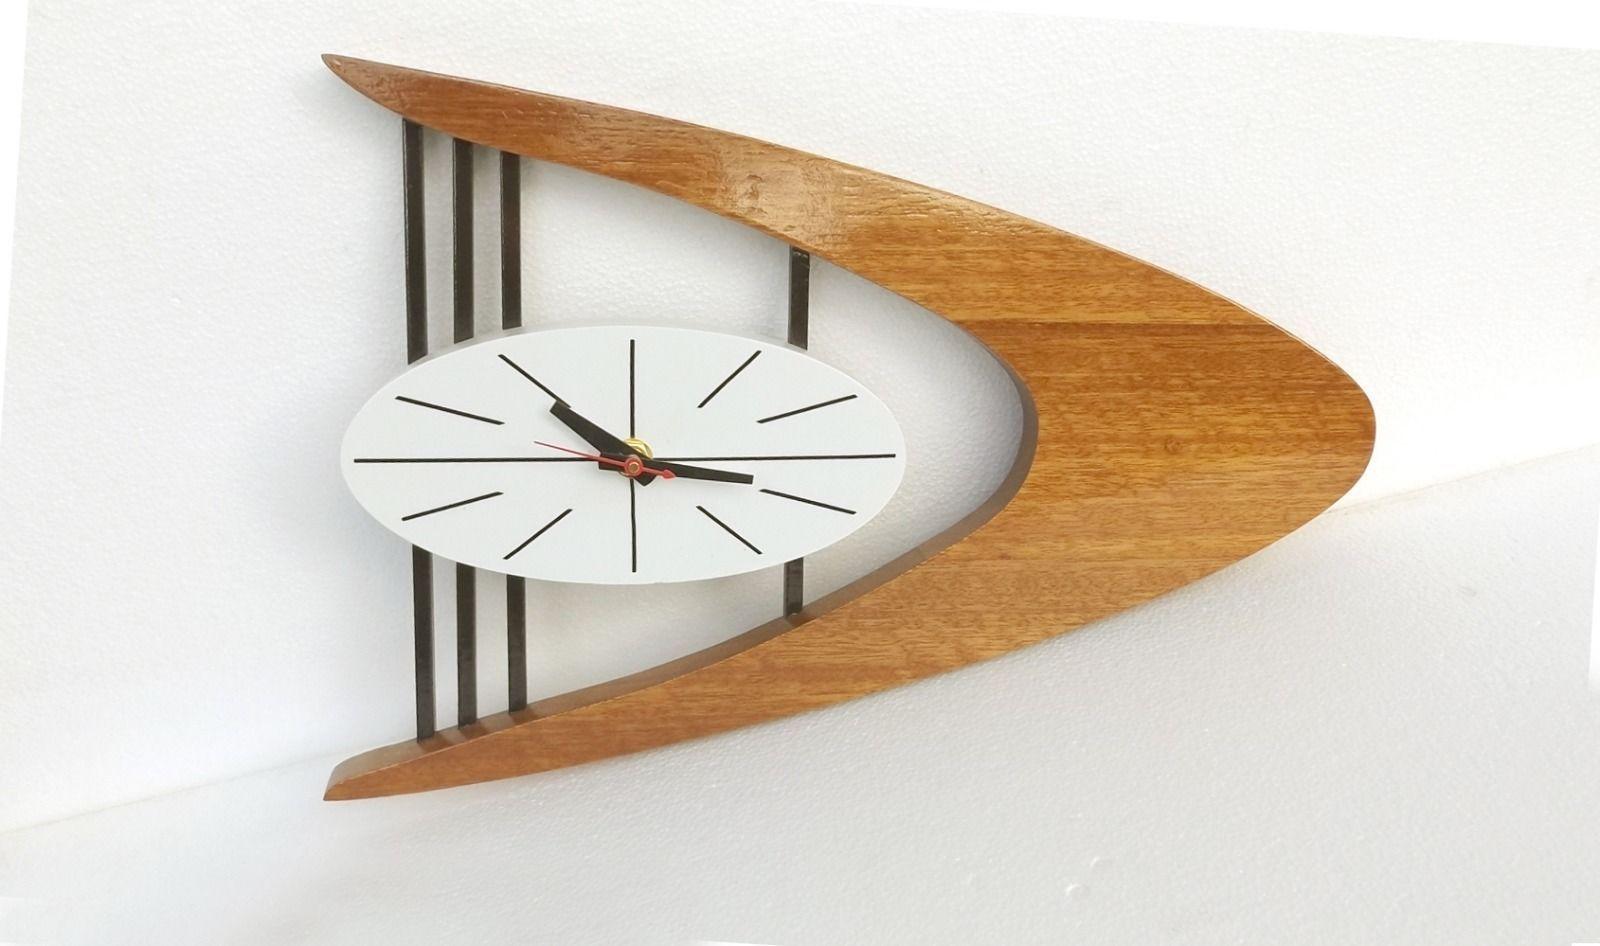 MID-CENTURY DANISH MODERN Boomerang Wall Clock Belart style   Antiques, Periods & Styles, Mid-Century Modernism   eBay!